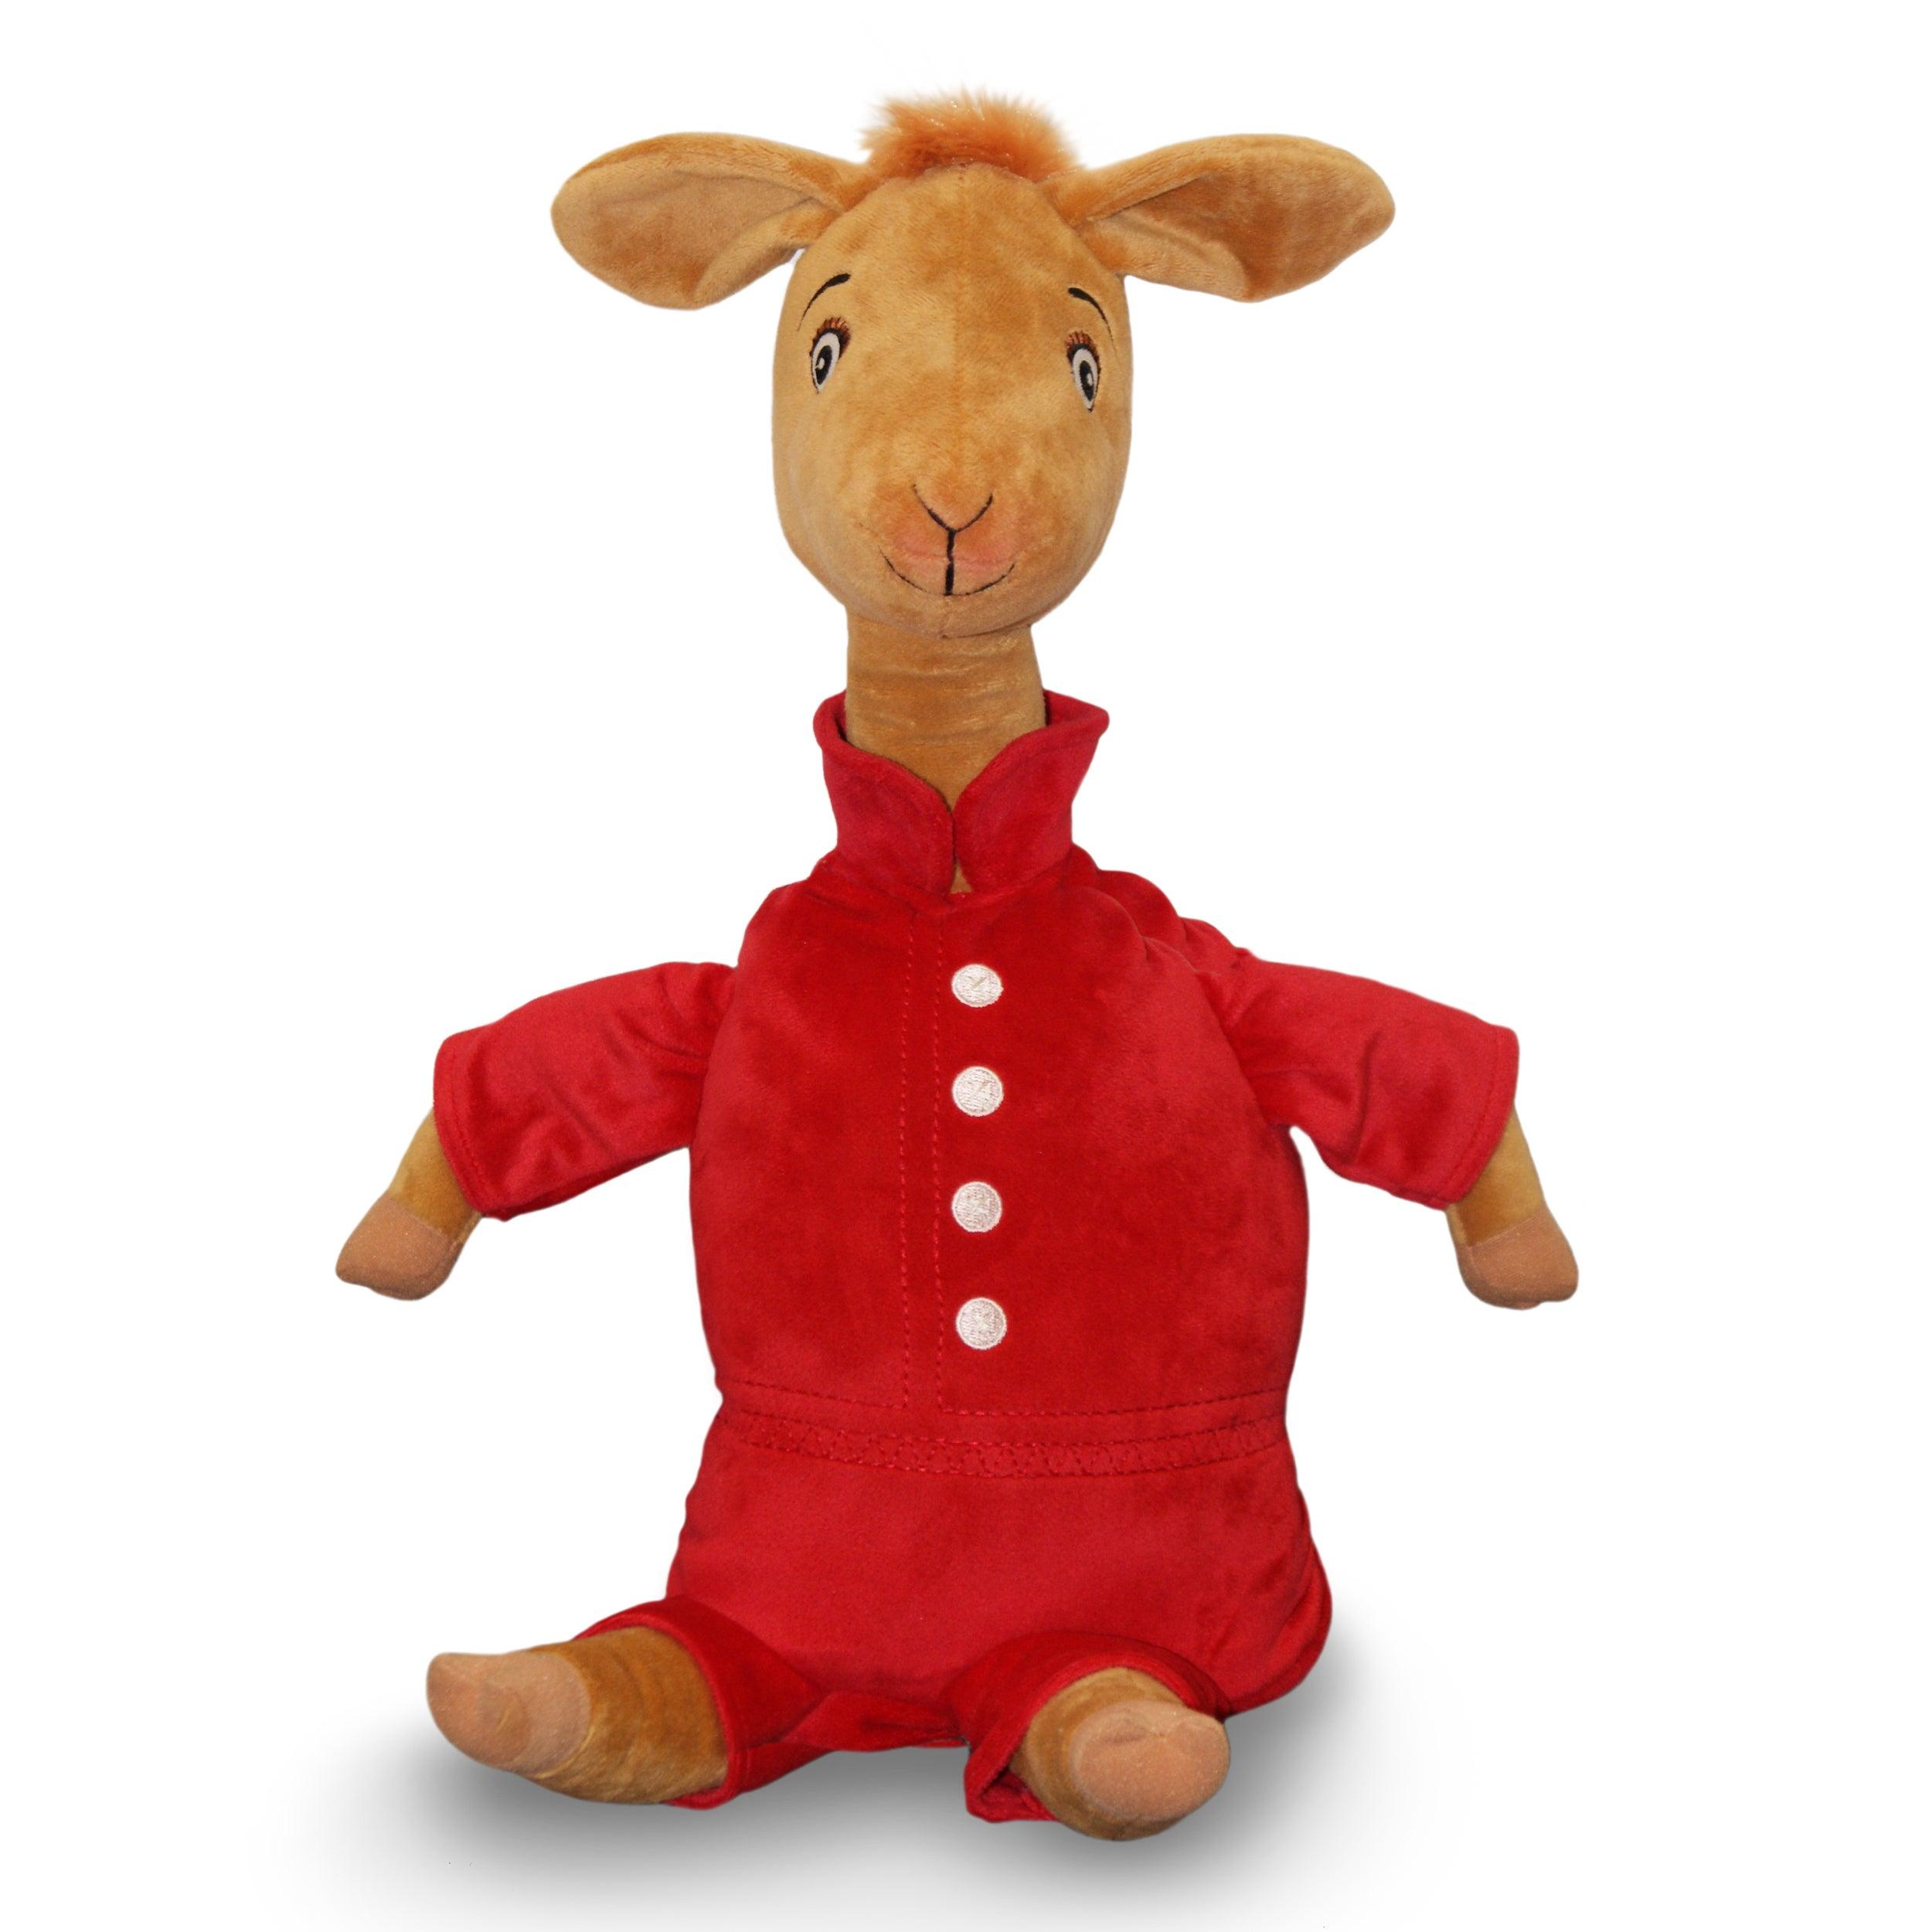 Zoobies 'Llama in Red Pajamas' Storytime Pal Adorable Plush Toy